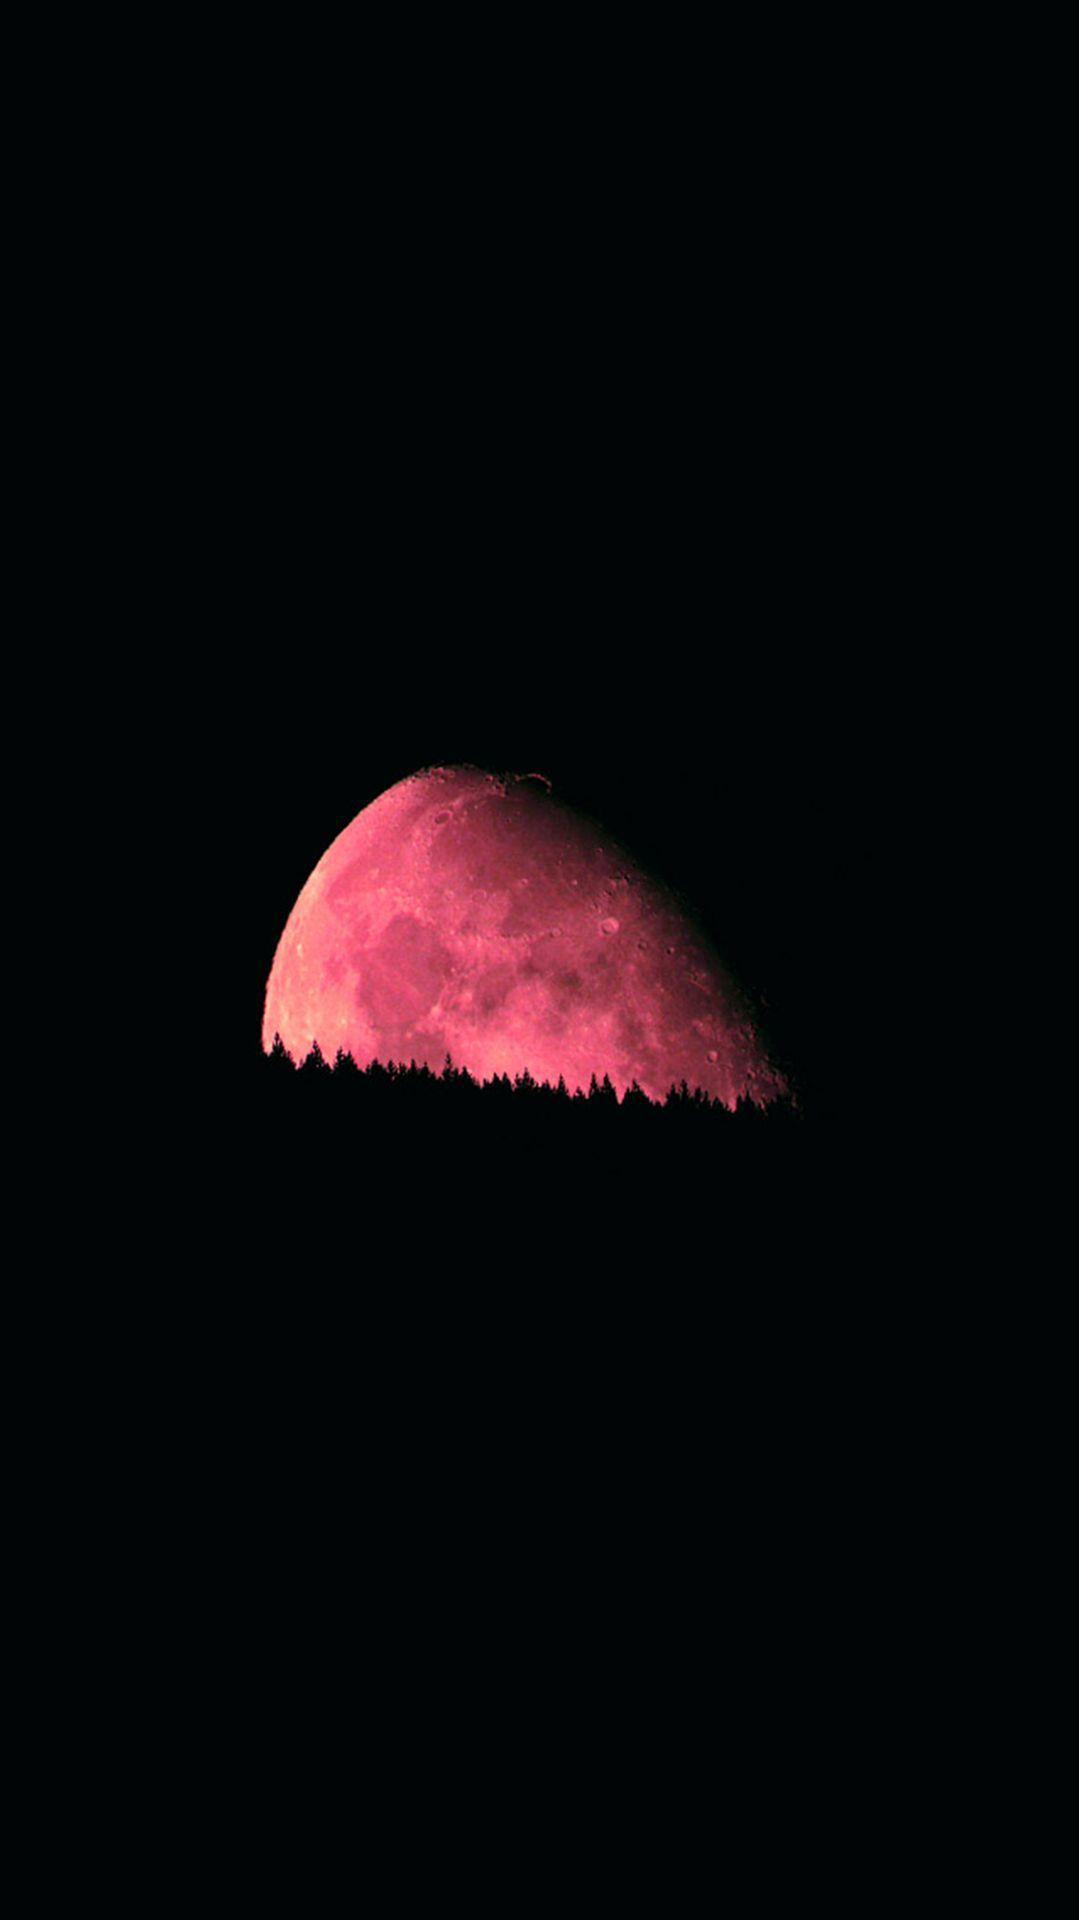 Big Red Moon Dark Night Iphone 6 Wallpaper Download Iphone Wallpapers Ipad Wallpapers One Stop Download Ipad Wallpaper Red Moon Iphone 5s Wallpaper